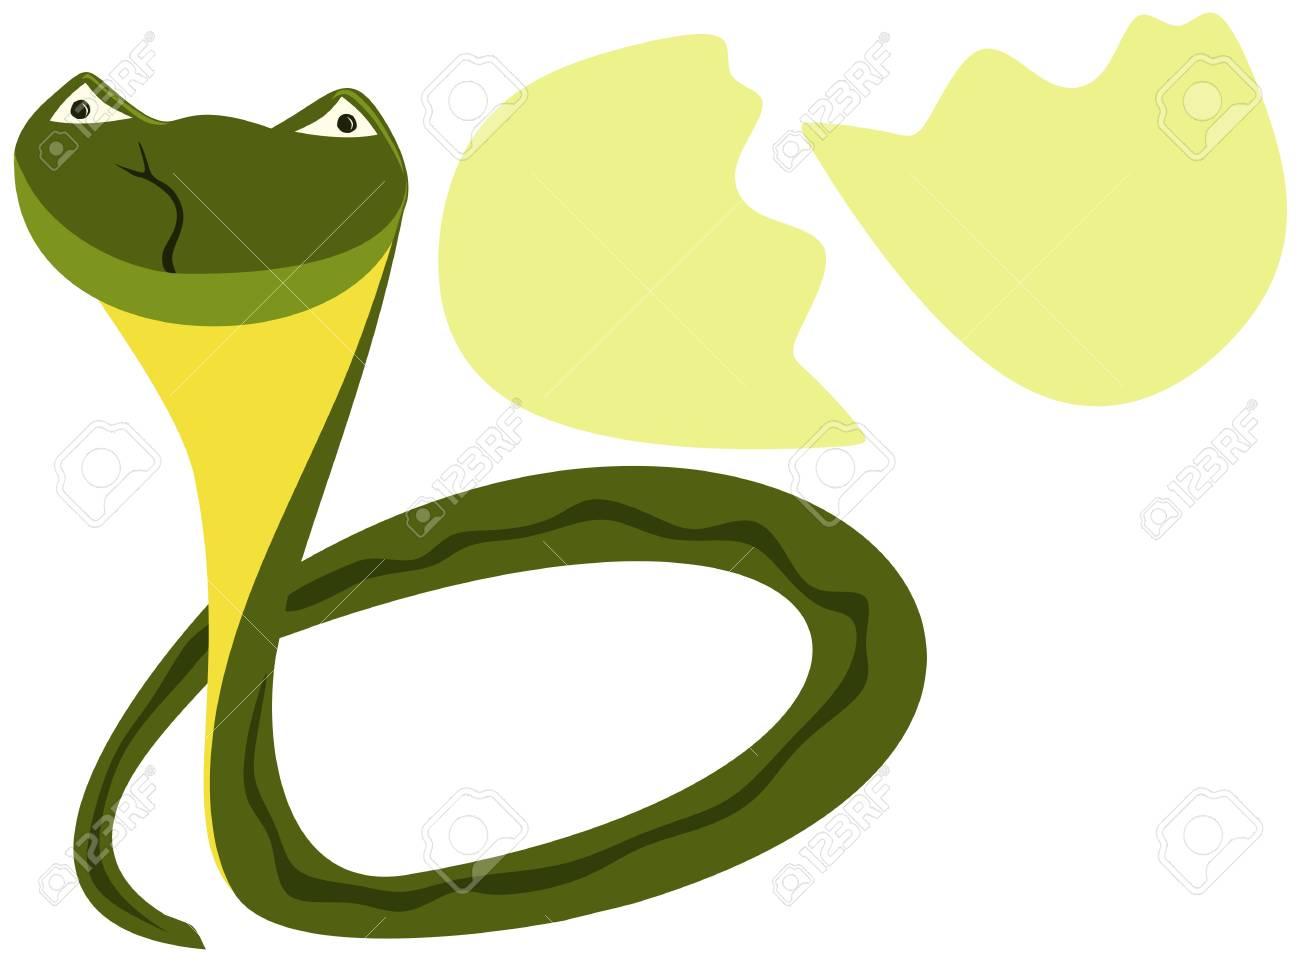 Cute newborn snake, symbol of 2013 Stock Vector - 15778022